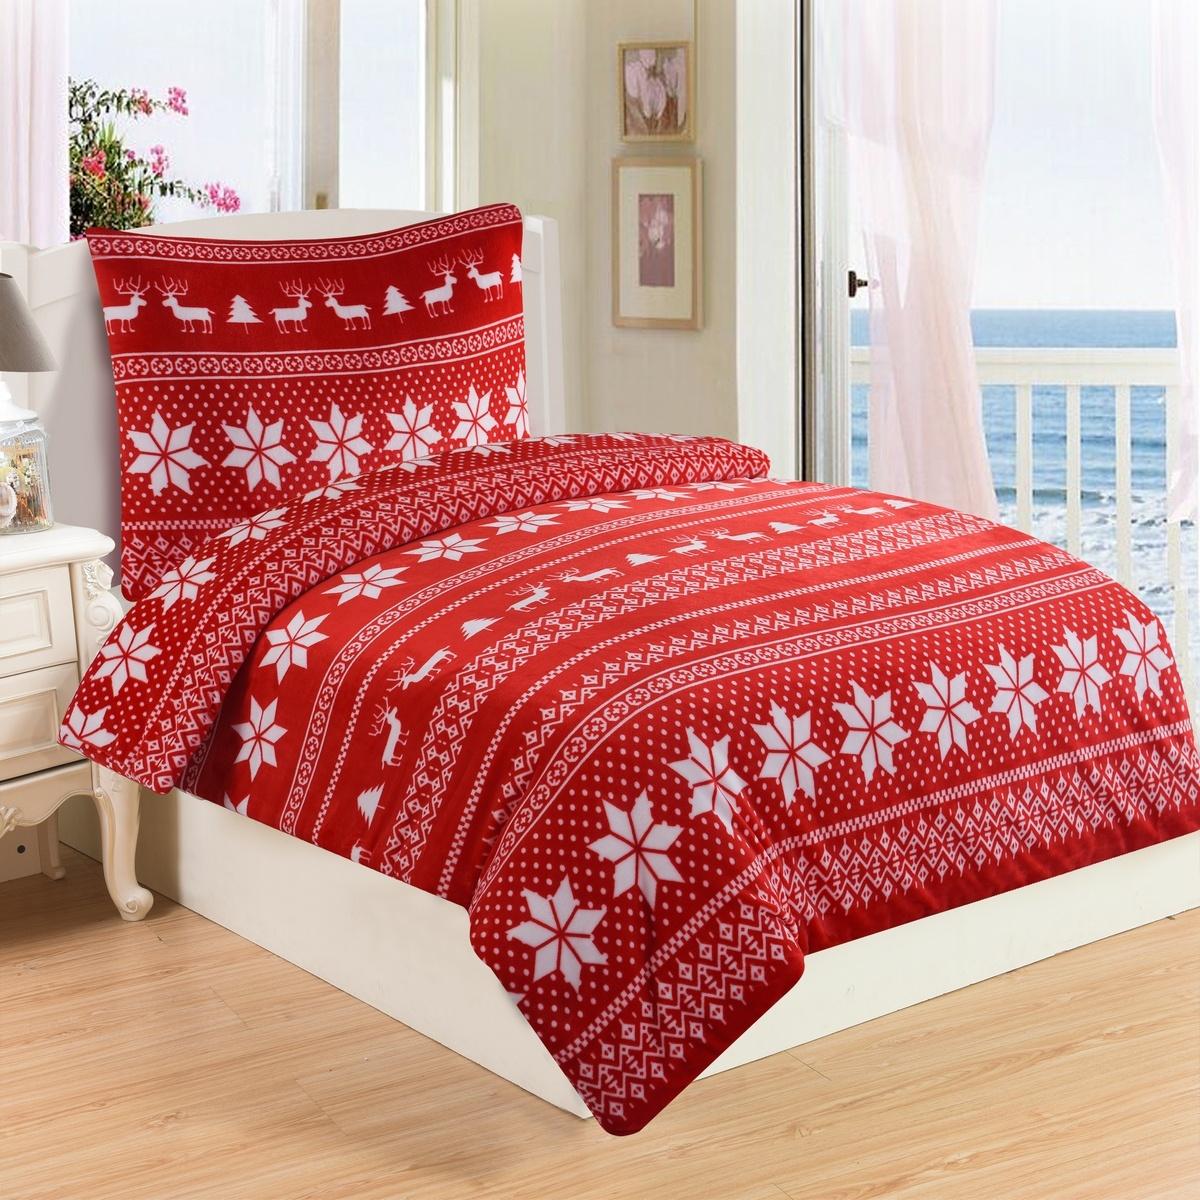 Obliečky mikroplyš Winter červená, 140 x 200 cm, 70 x 90 cm, 140 x 200 cm, 70 x 90 cm